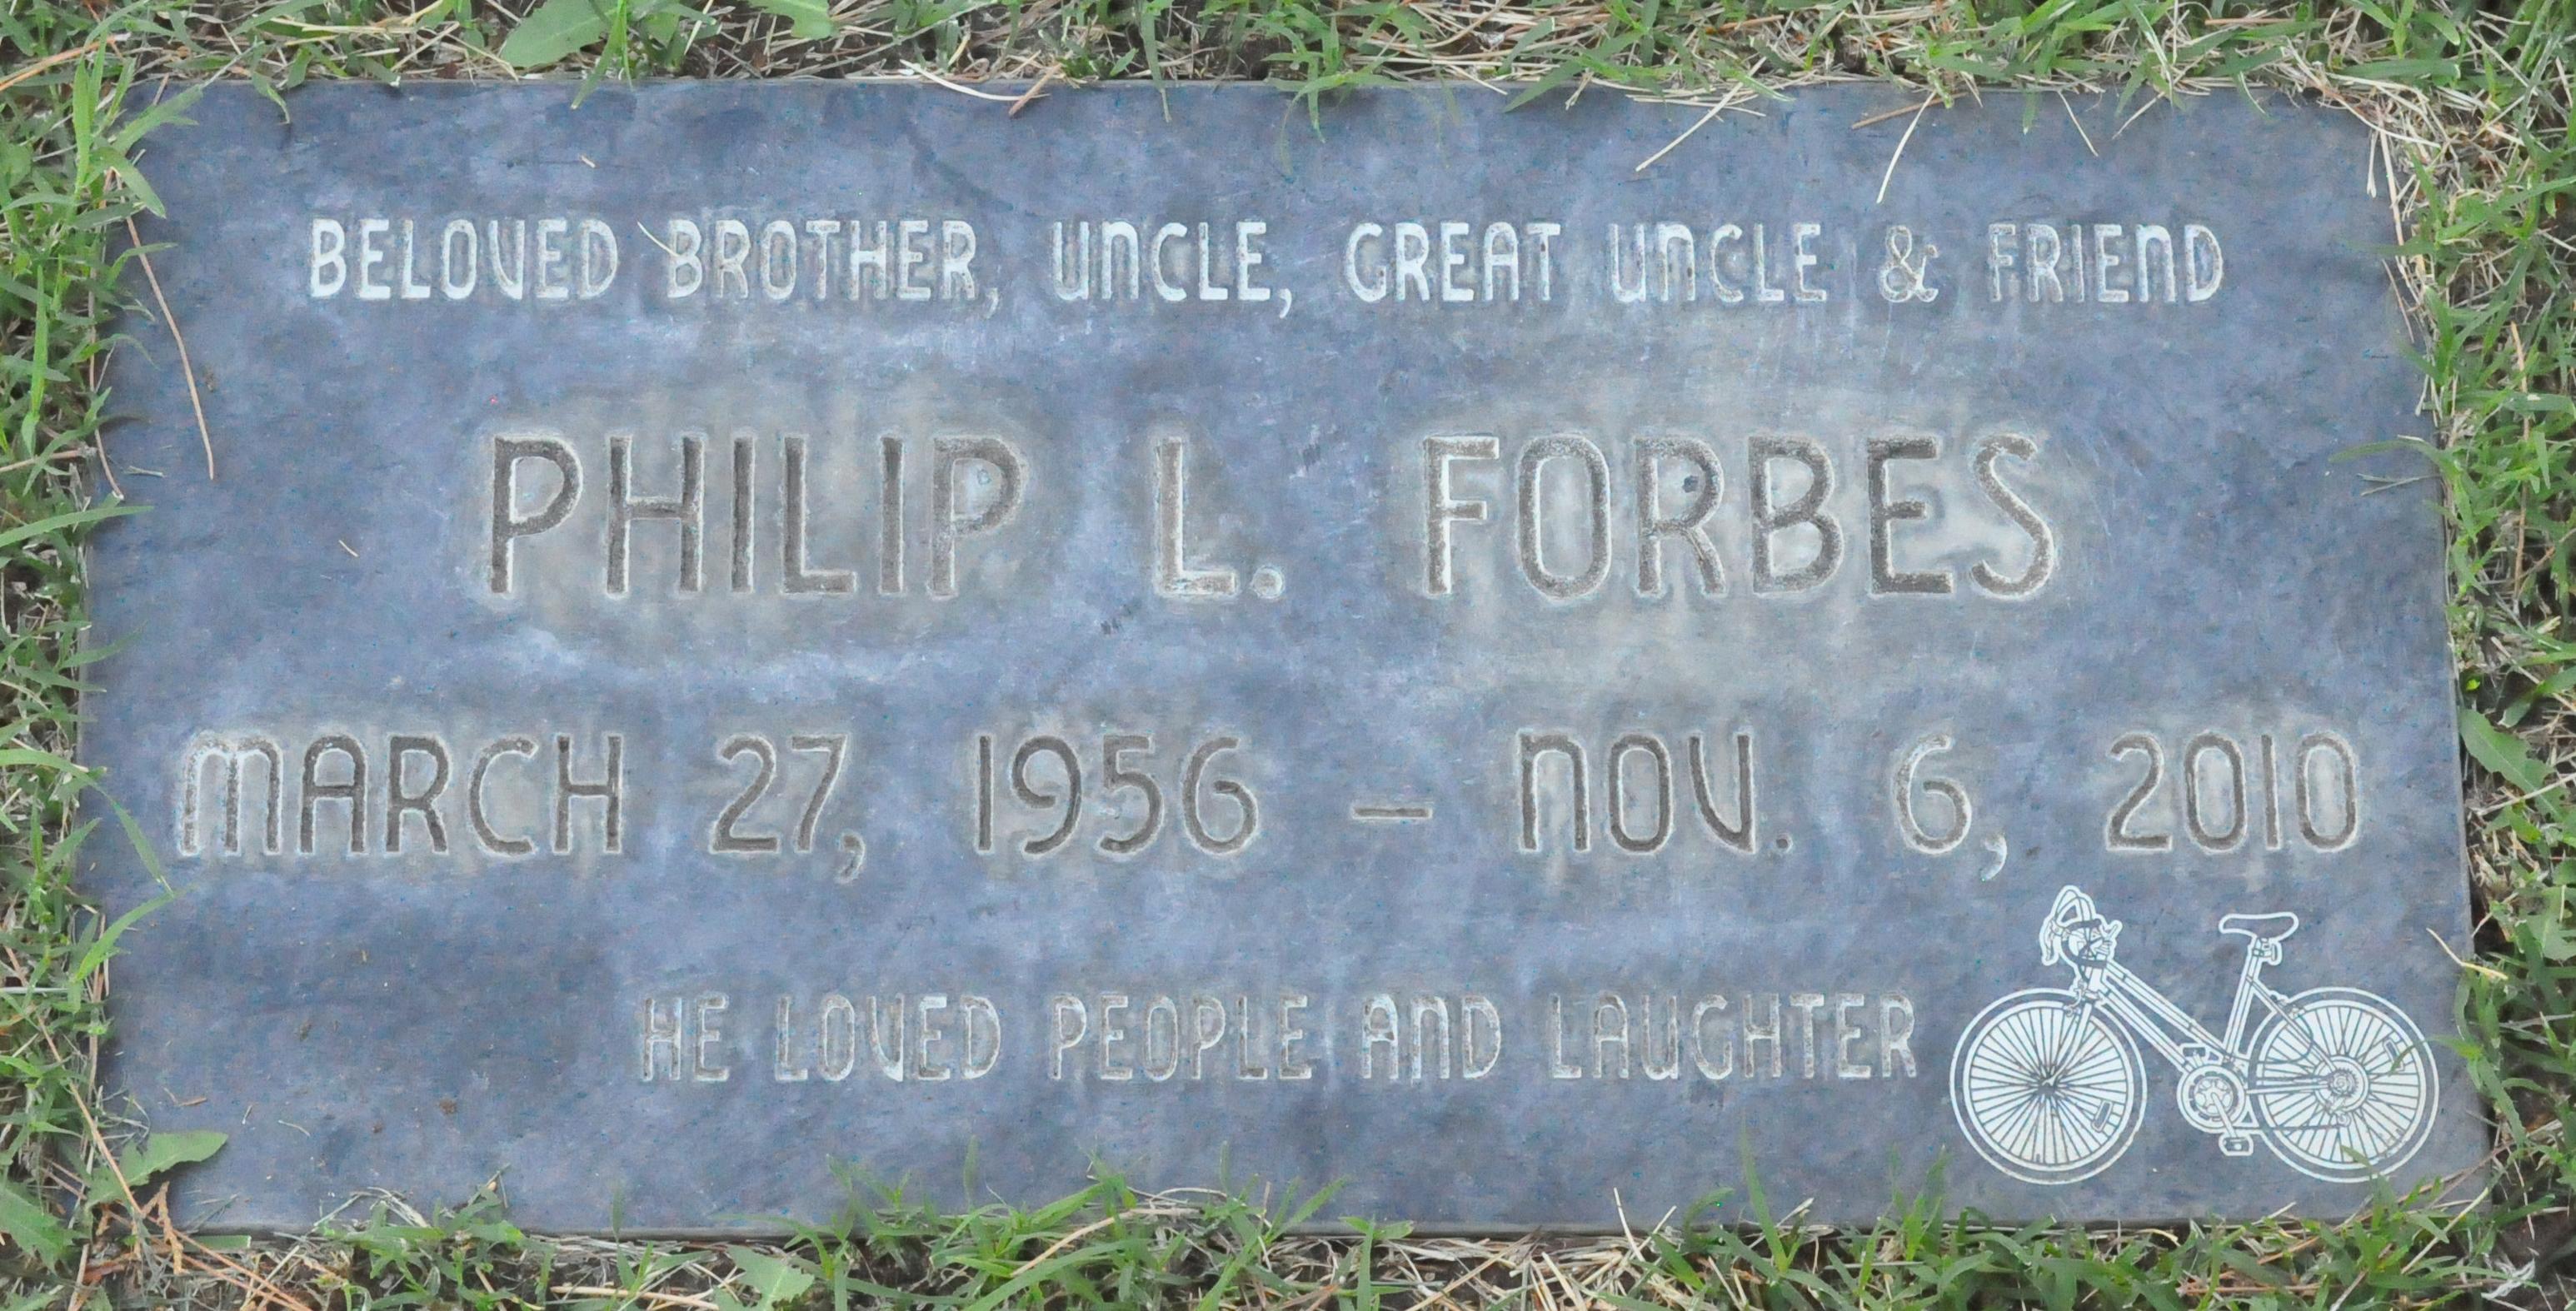 Phillip Lester Forbes